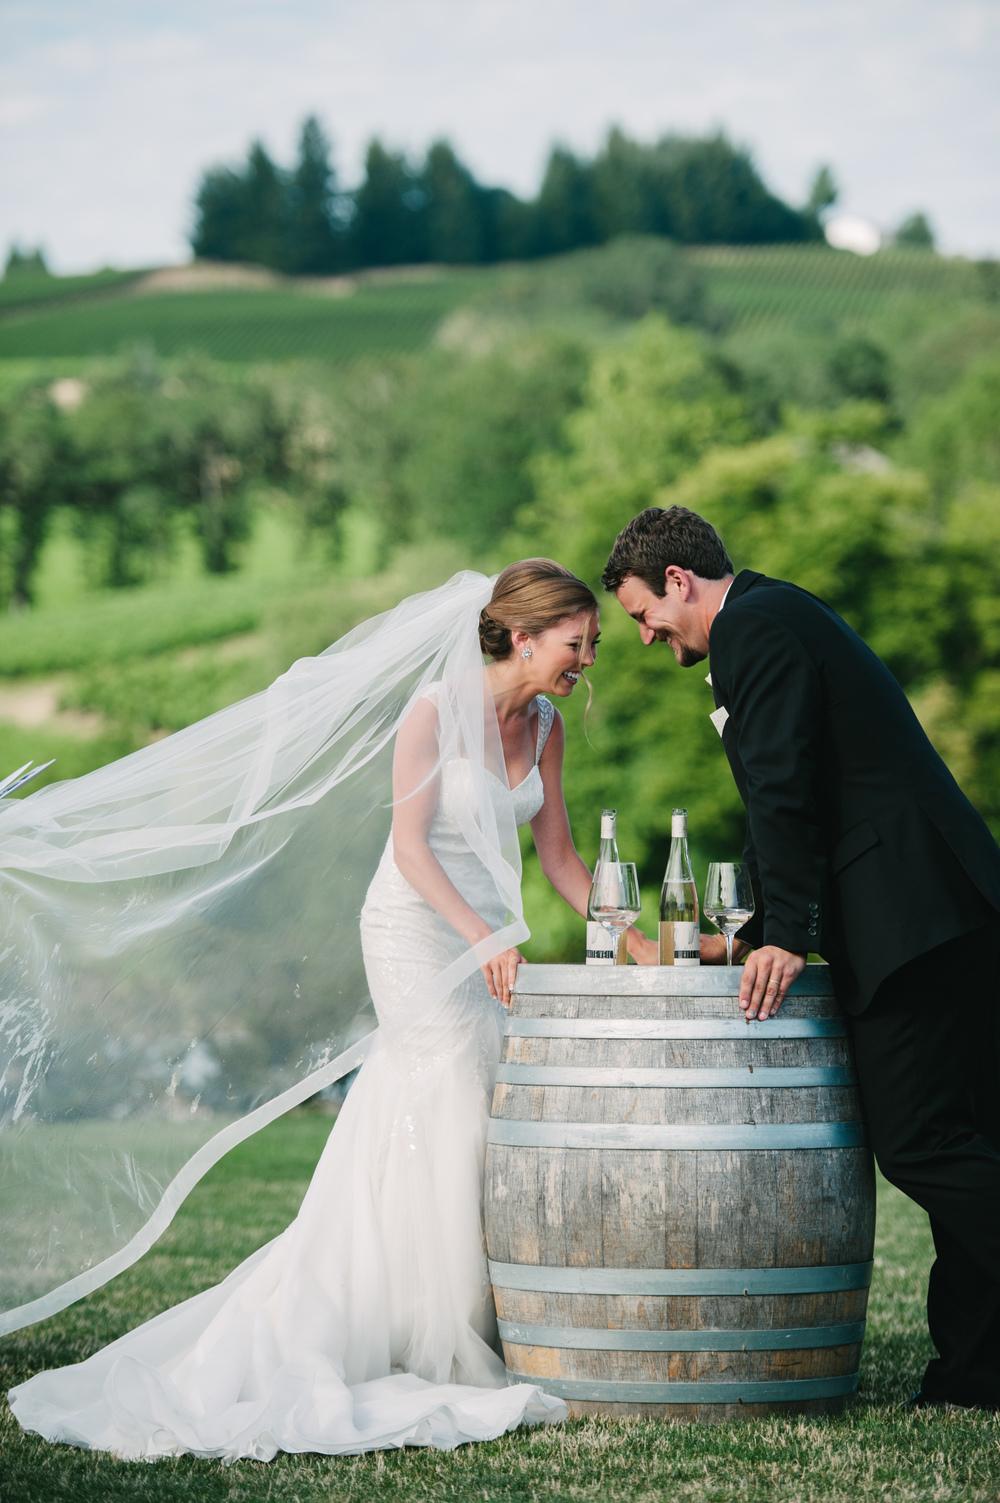 14-zenith-vineyard-wedding-portland-oregon-christa-taylor-photography.jpg